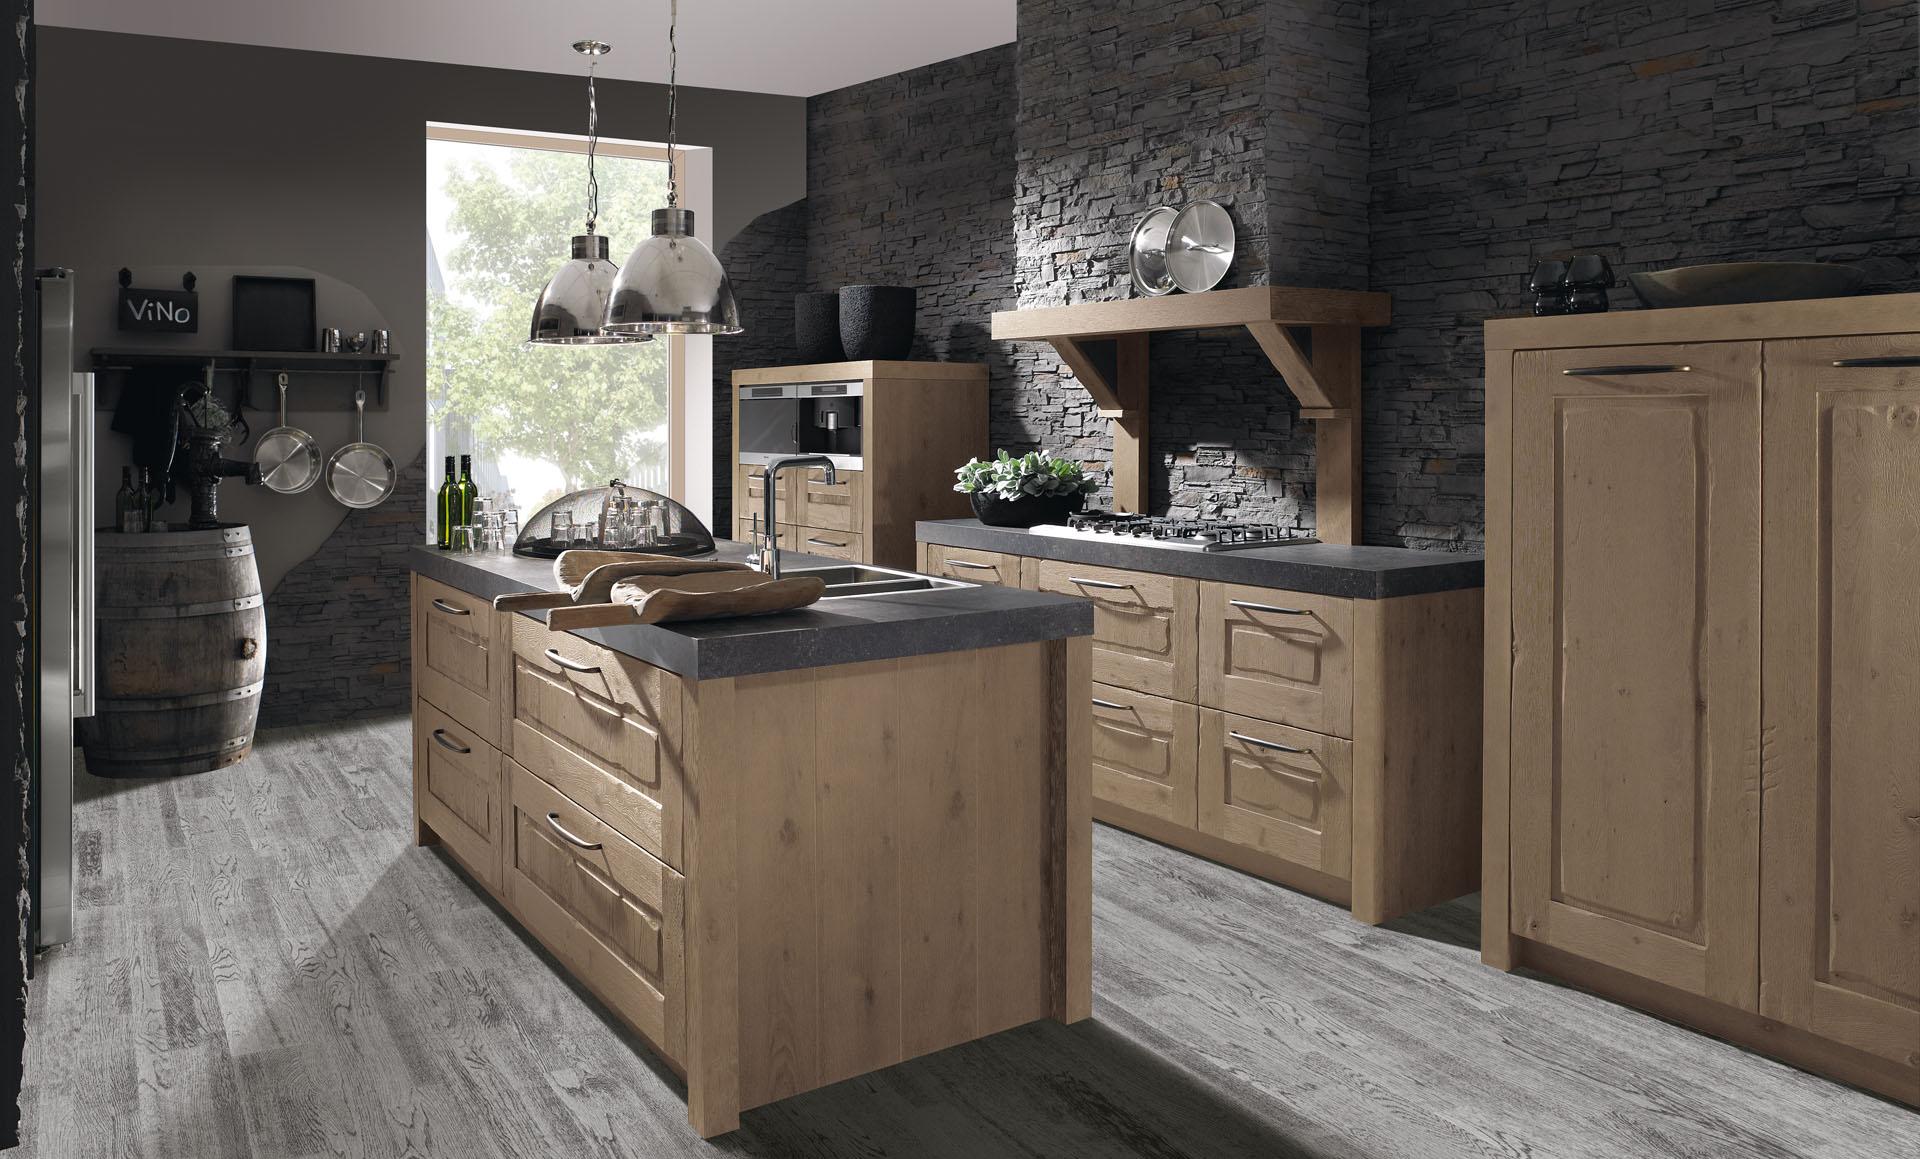 Van Wanrooij Keukens : Industriële keukens nieuwe keuken kopen aswa keukens